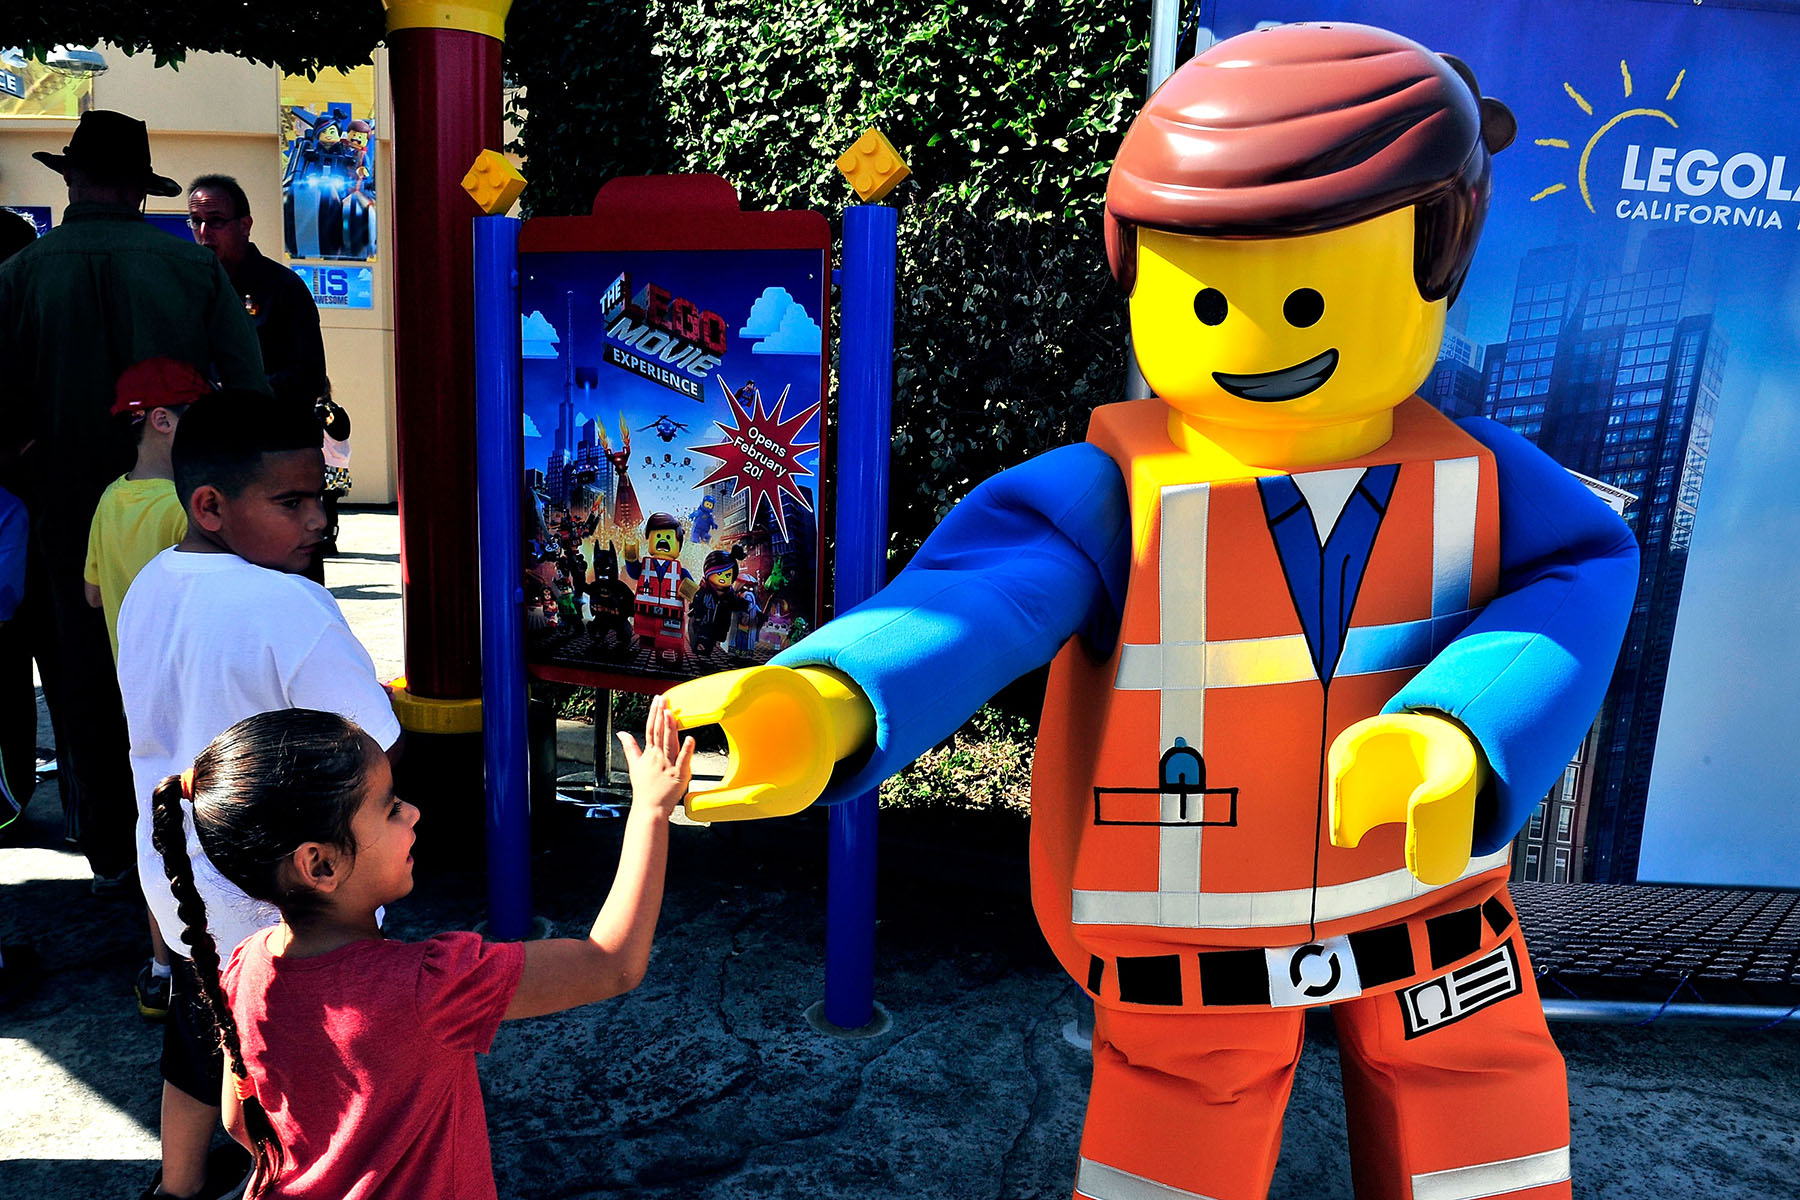 lego-movie-experience-legoland.jpg